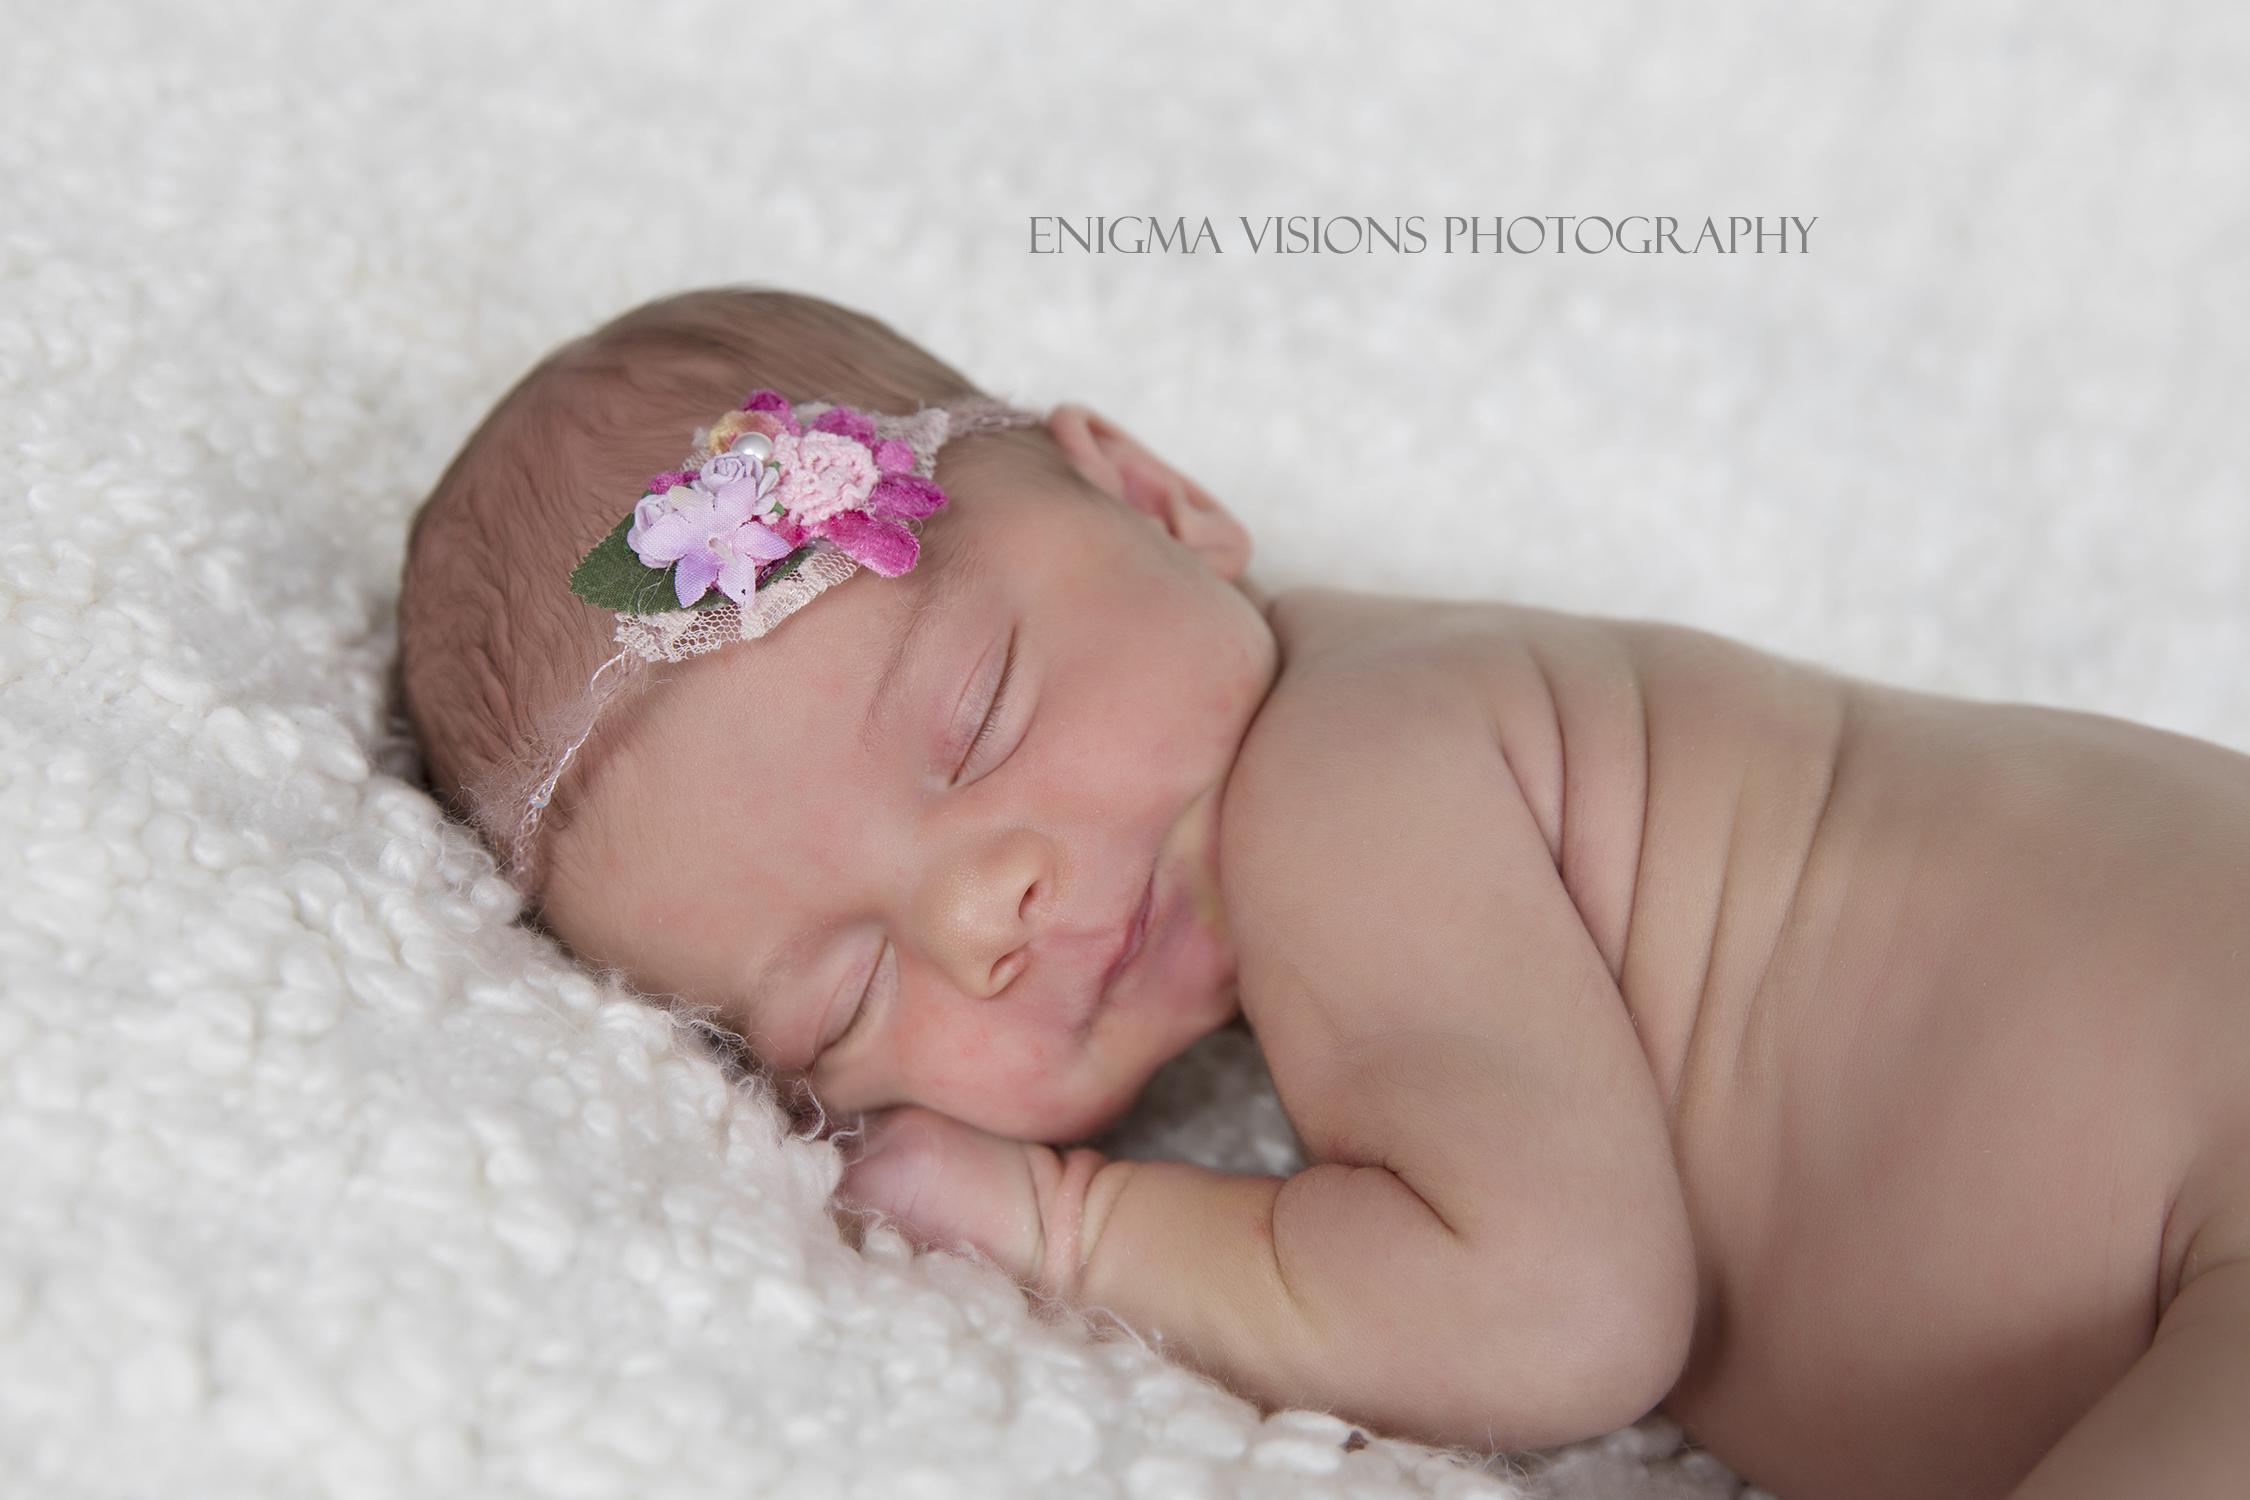 Enigma_Visions_Photography_NEWBORN_Jorgie008.jpg